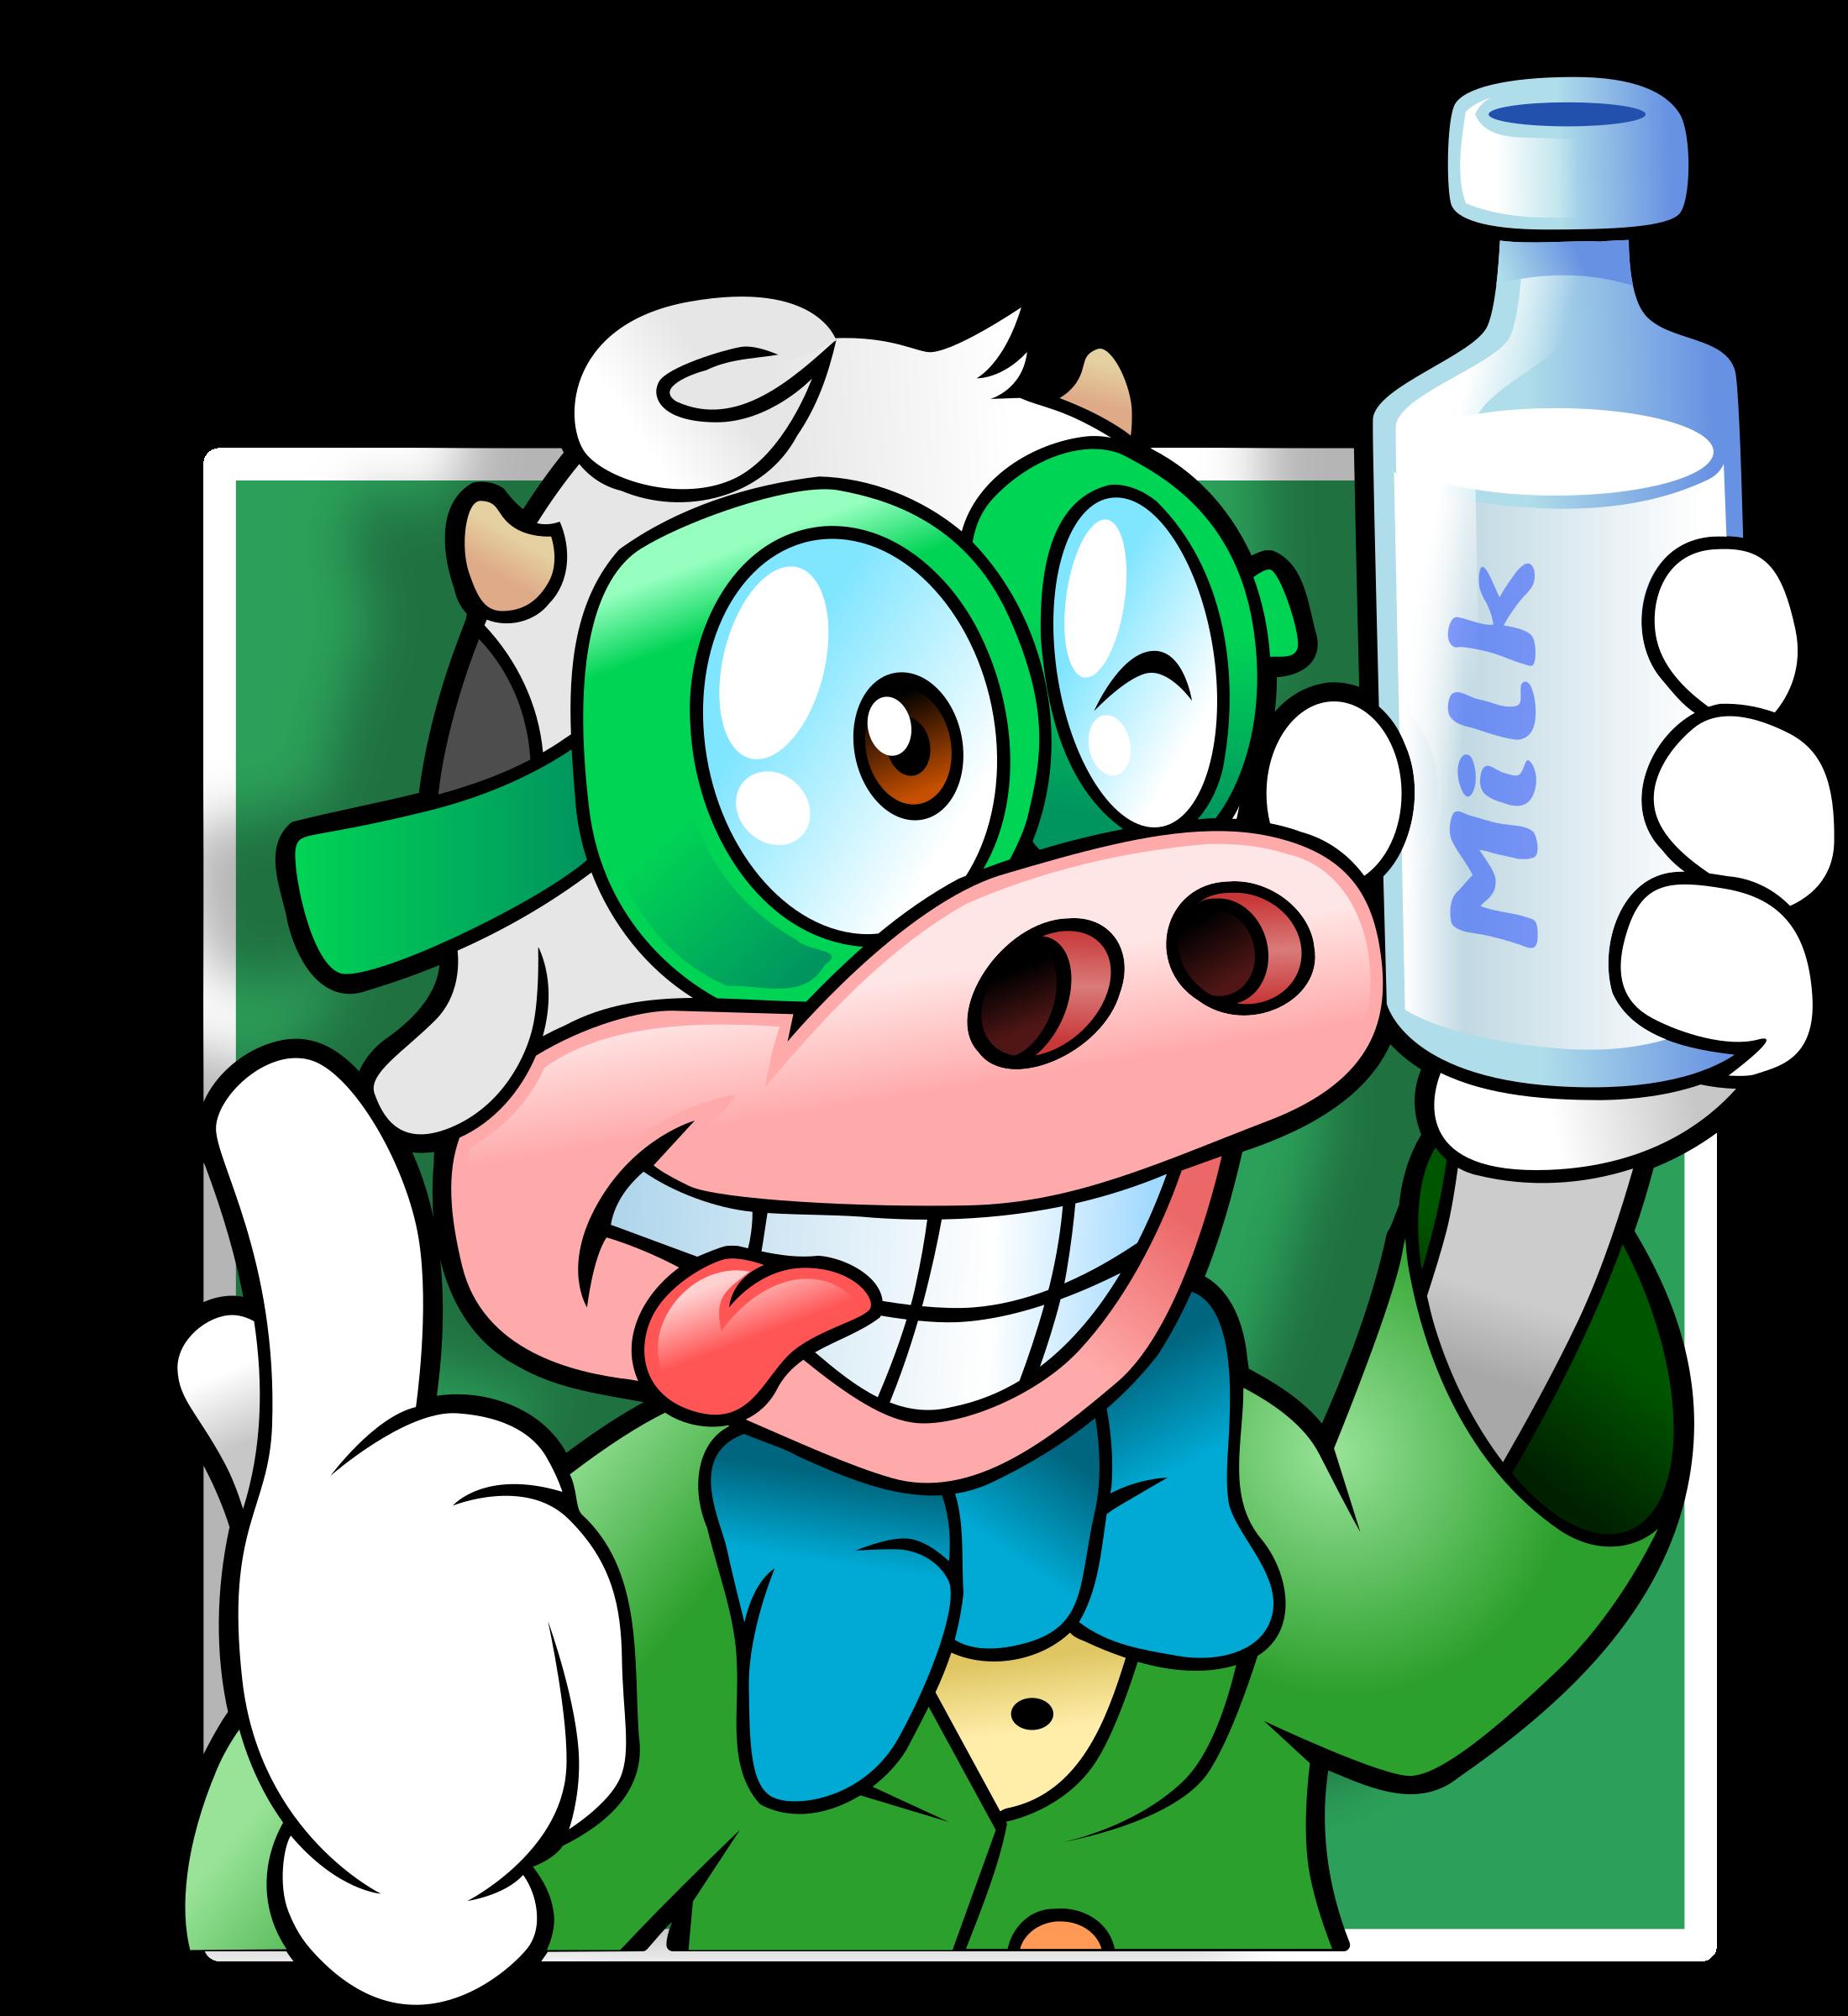 D20 clipart avatar. Nerd cow big image